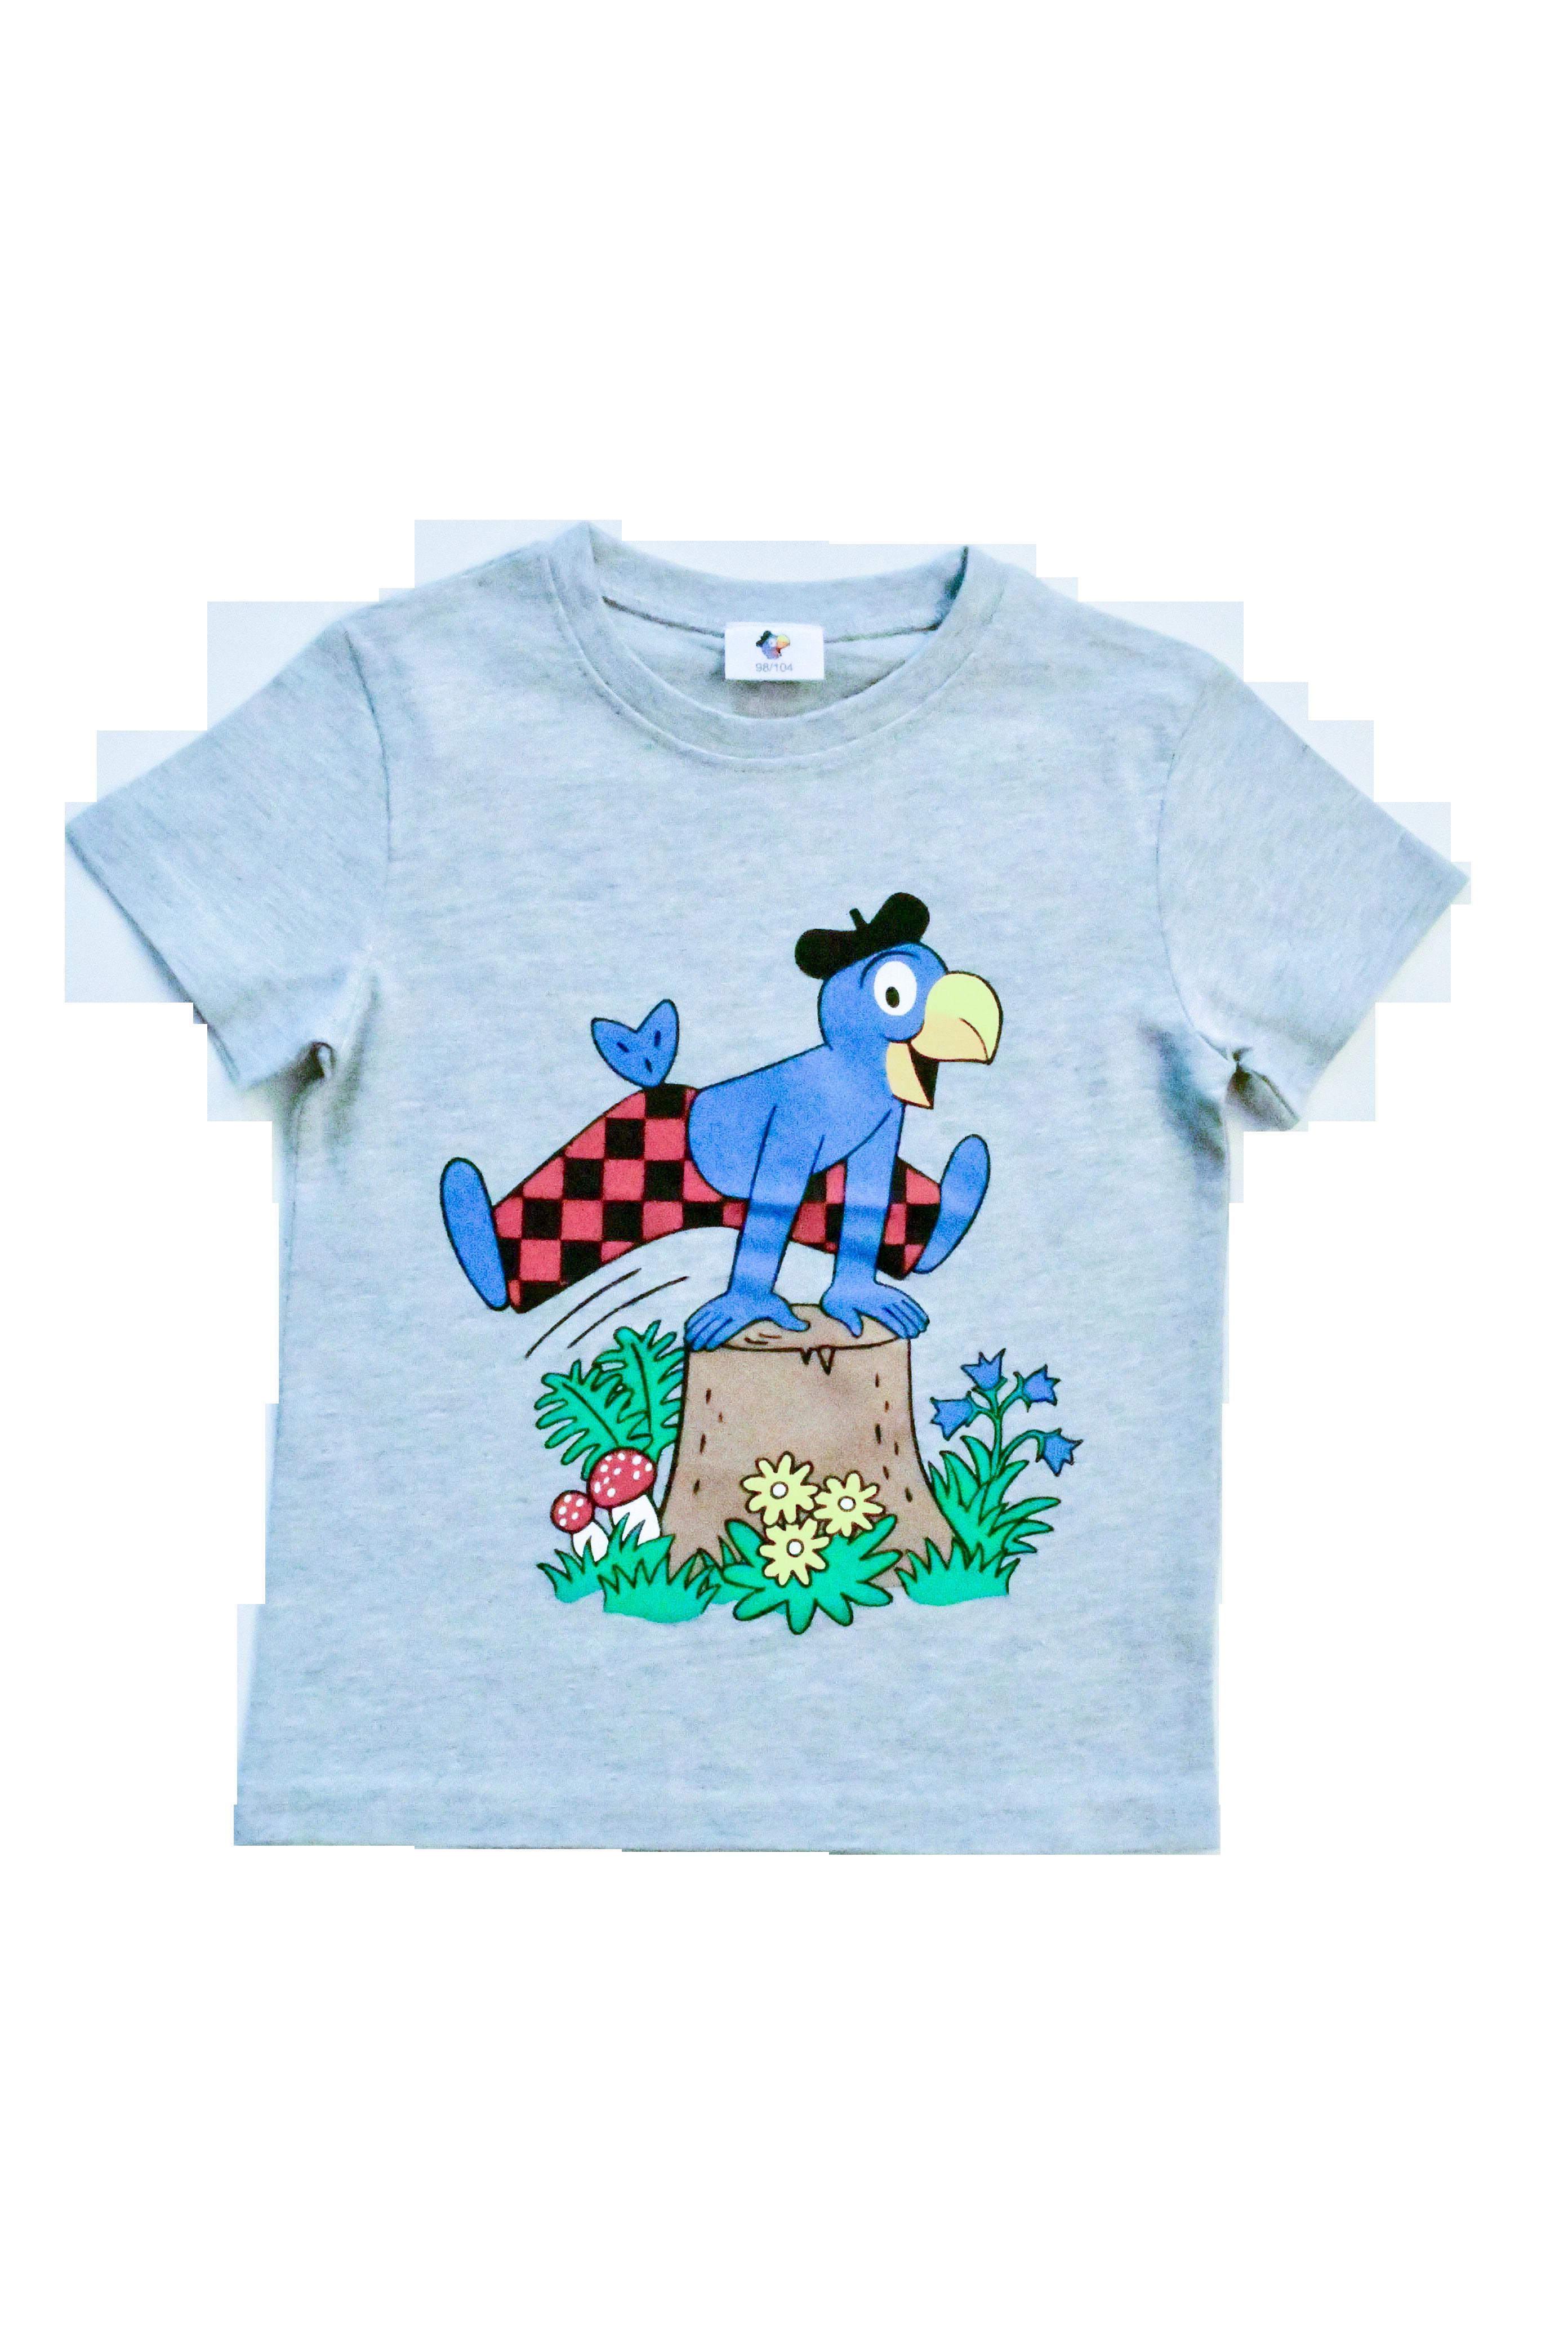 Globi T-Shirt grau Sprung 122/128